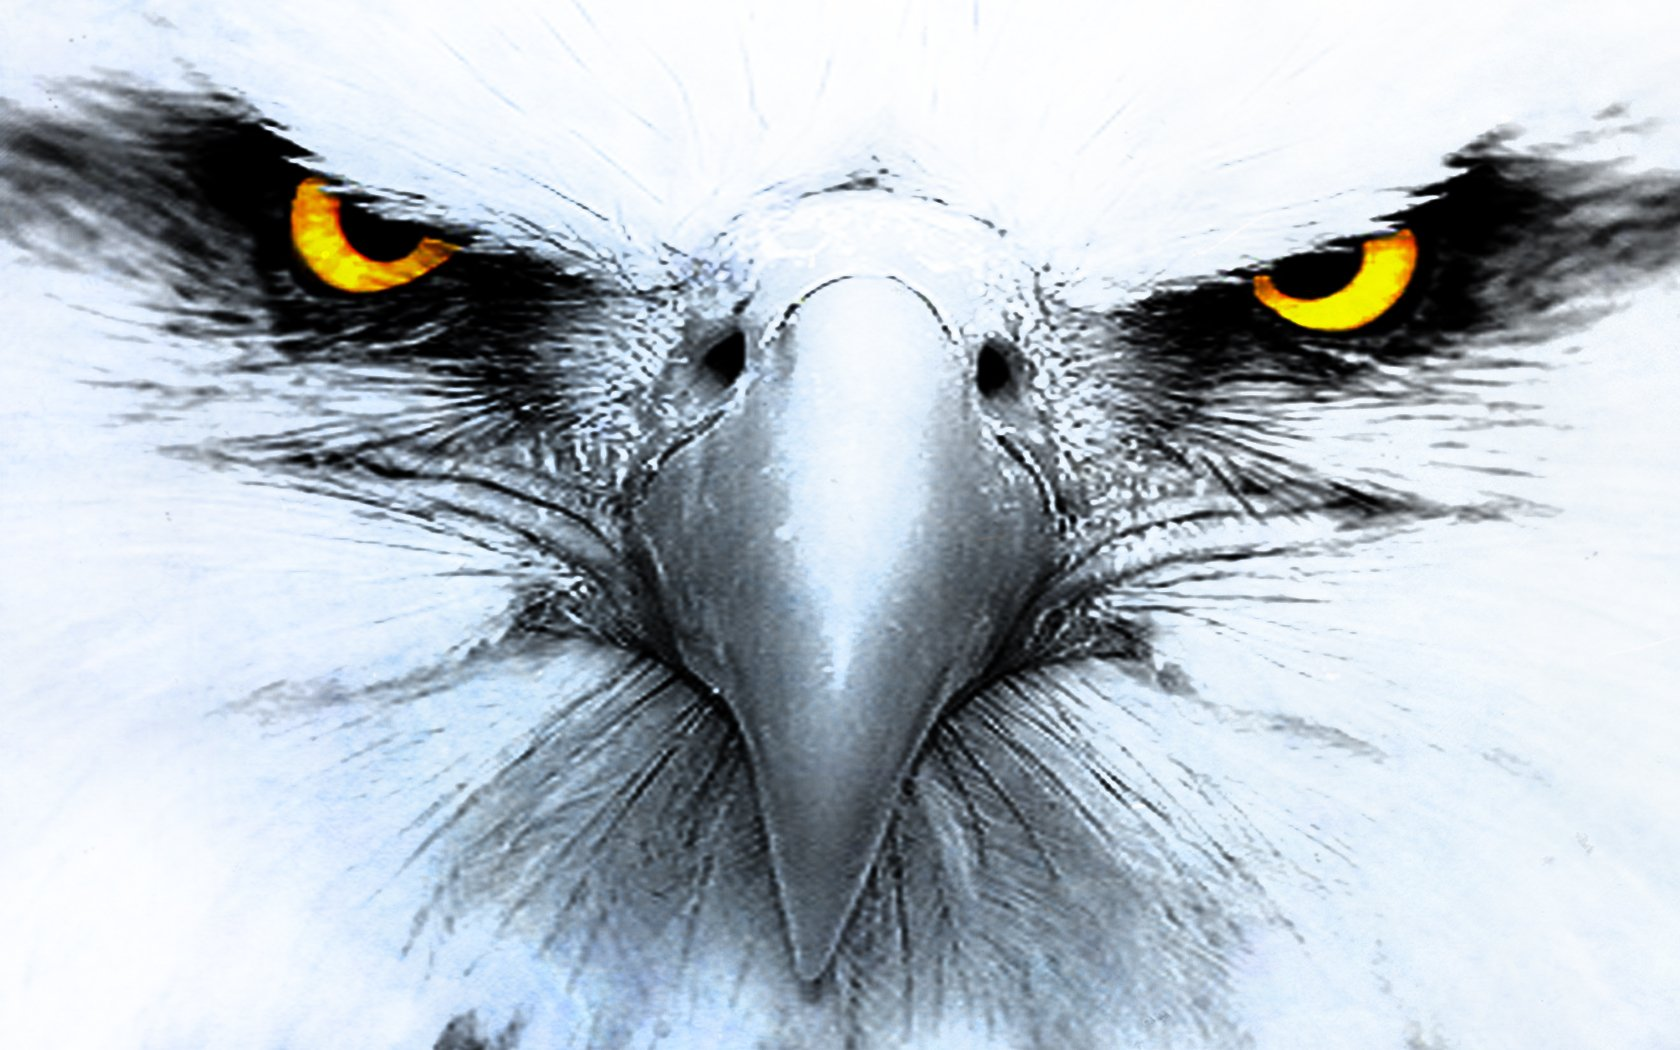 Hd wallpaper background id 150464 1680x1050 animal eagle